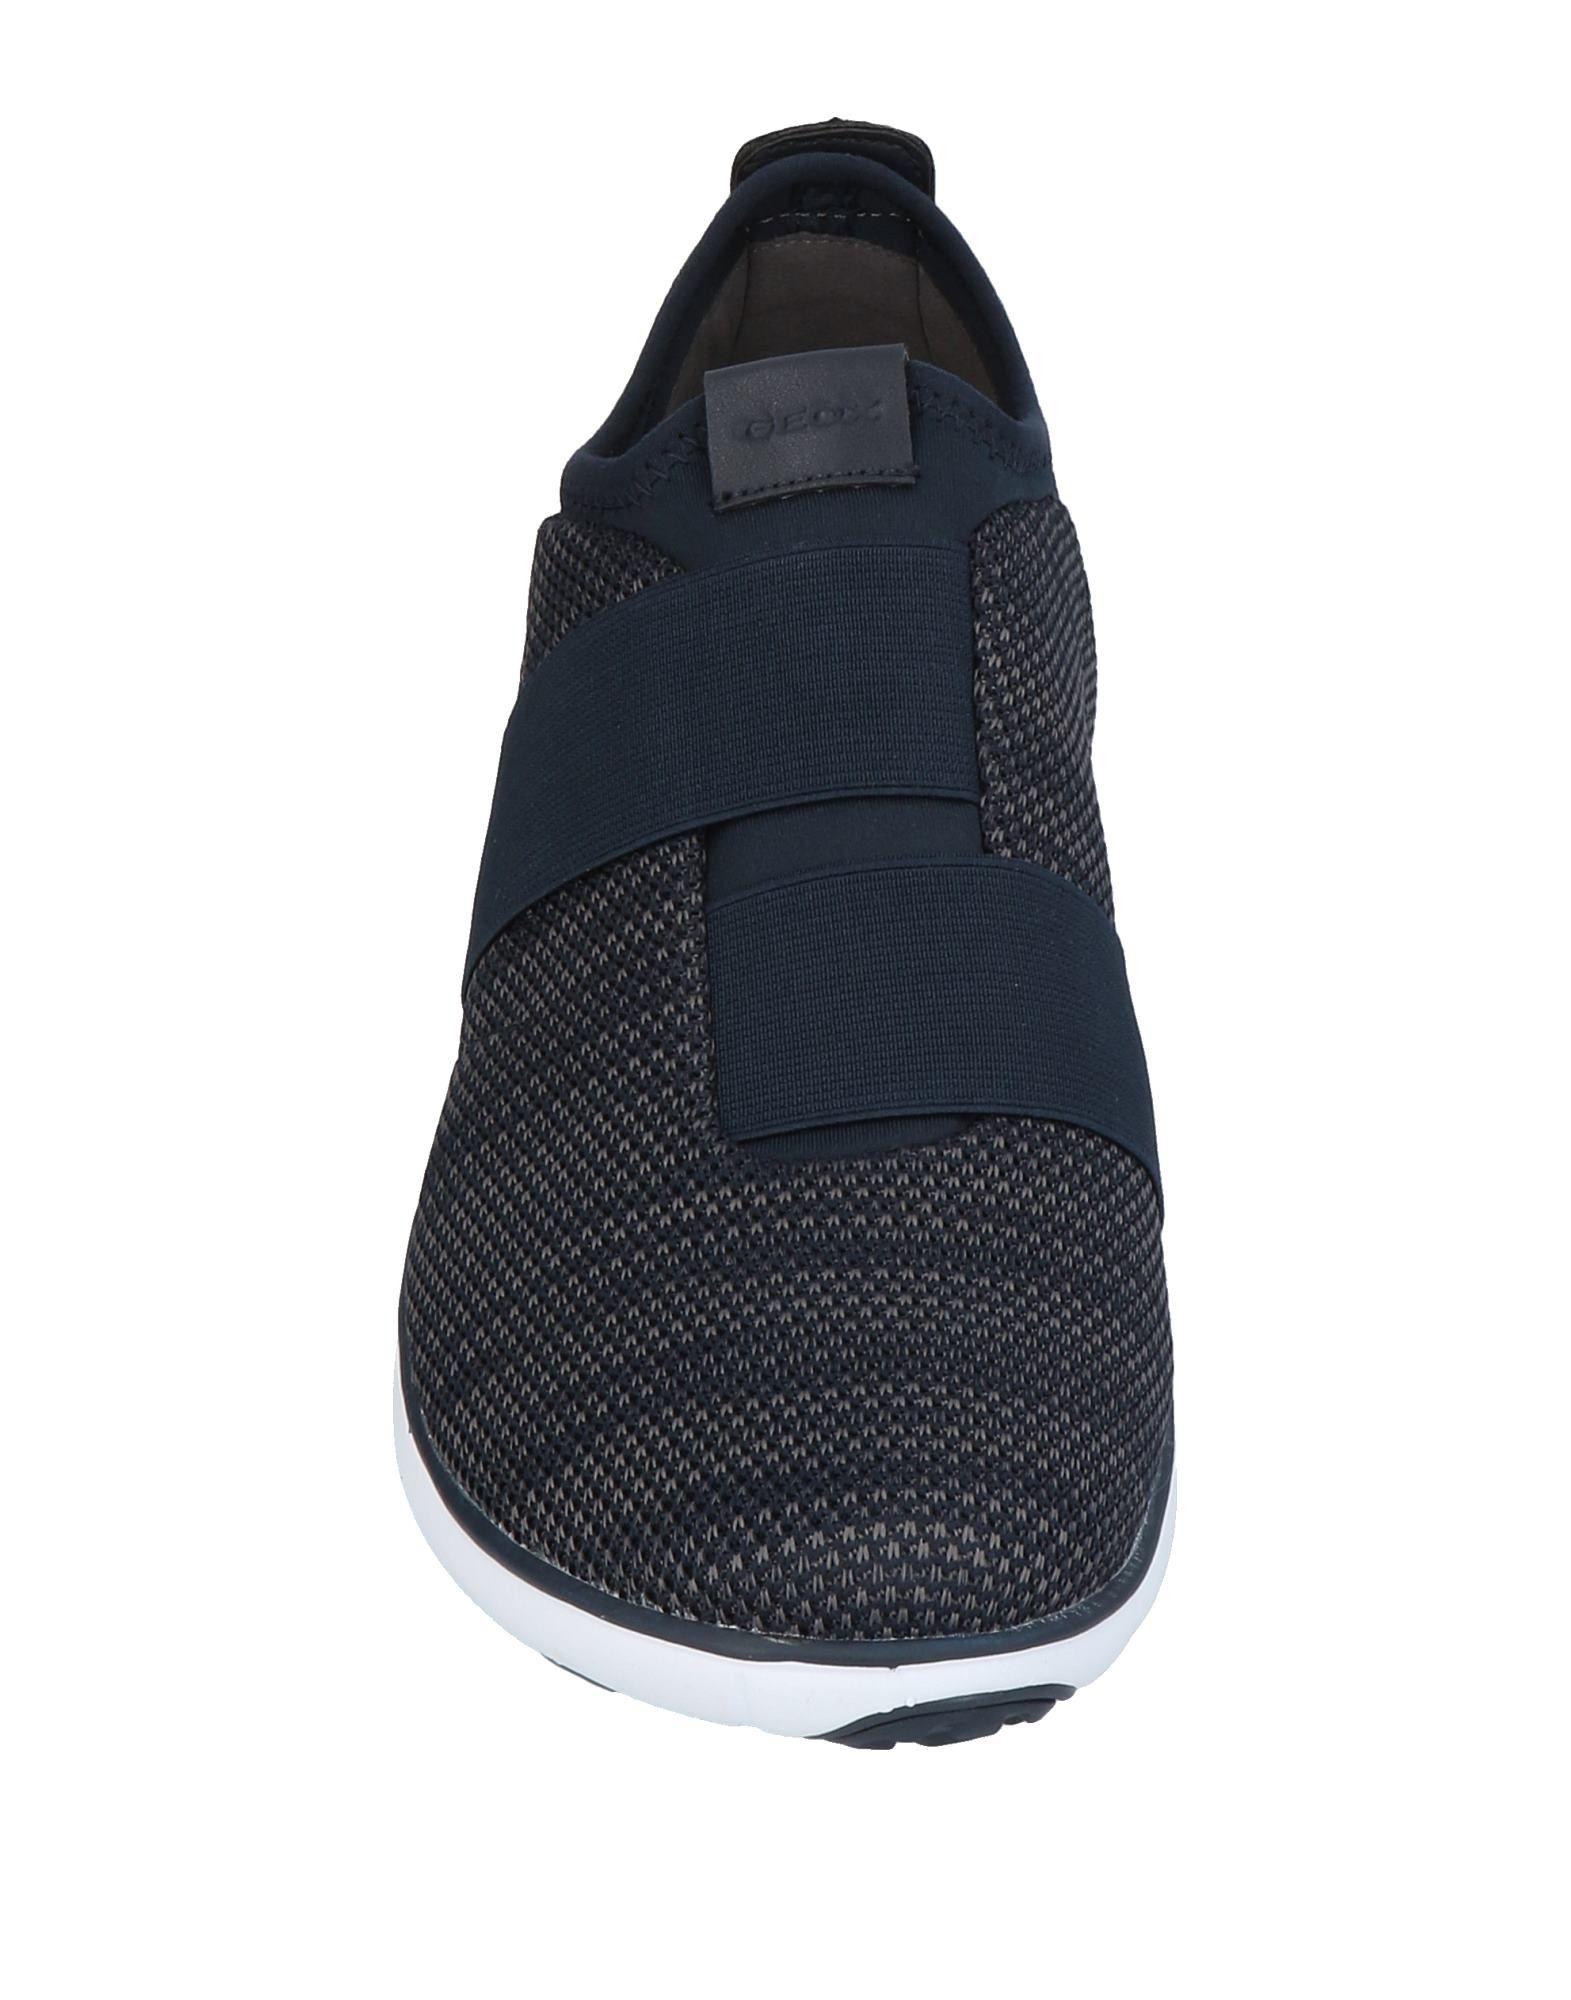 11454084SH Geox Sneakers Herren  11454084SH  Heiße Schuhe 15fd12